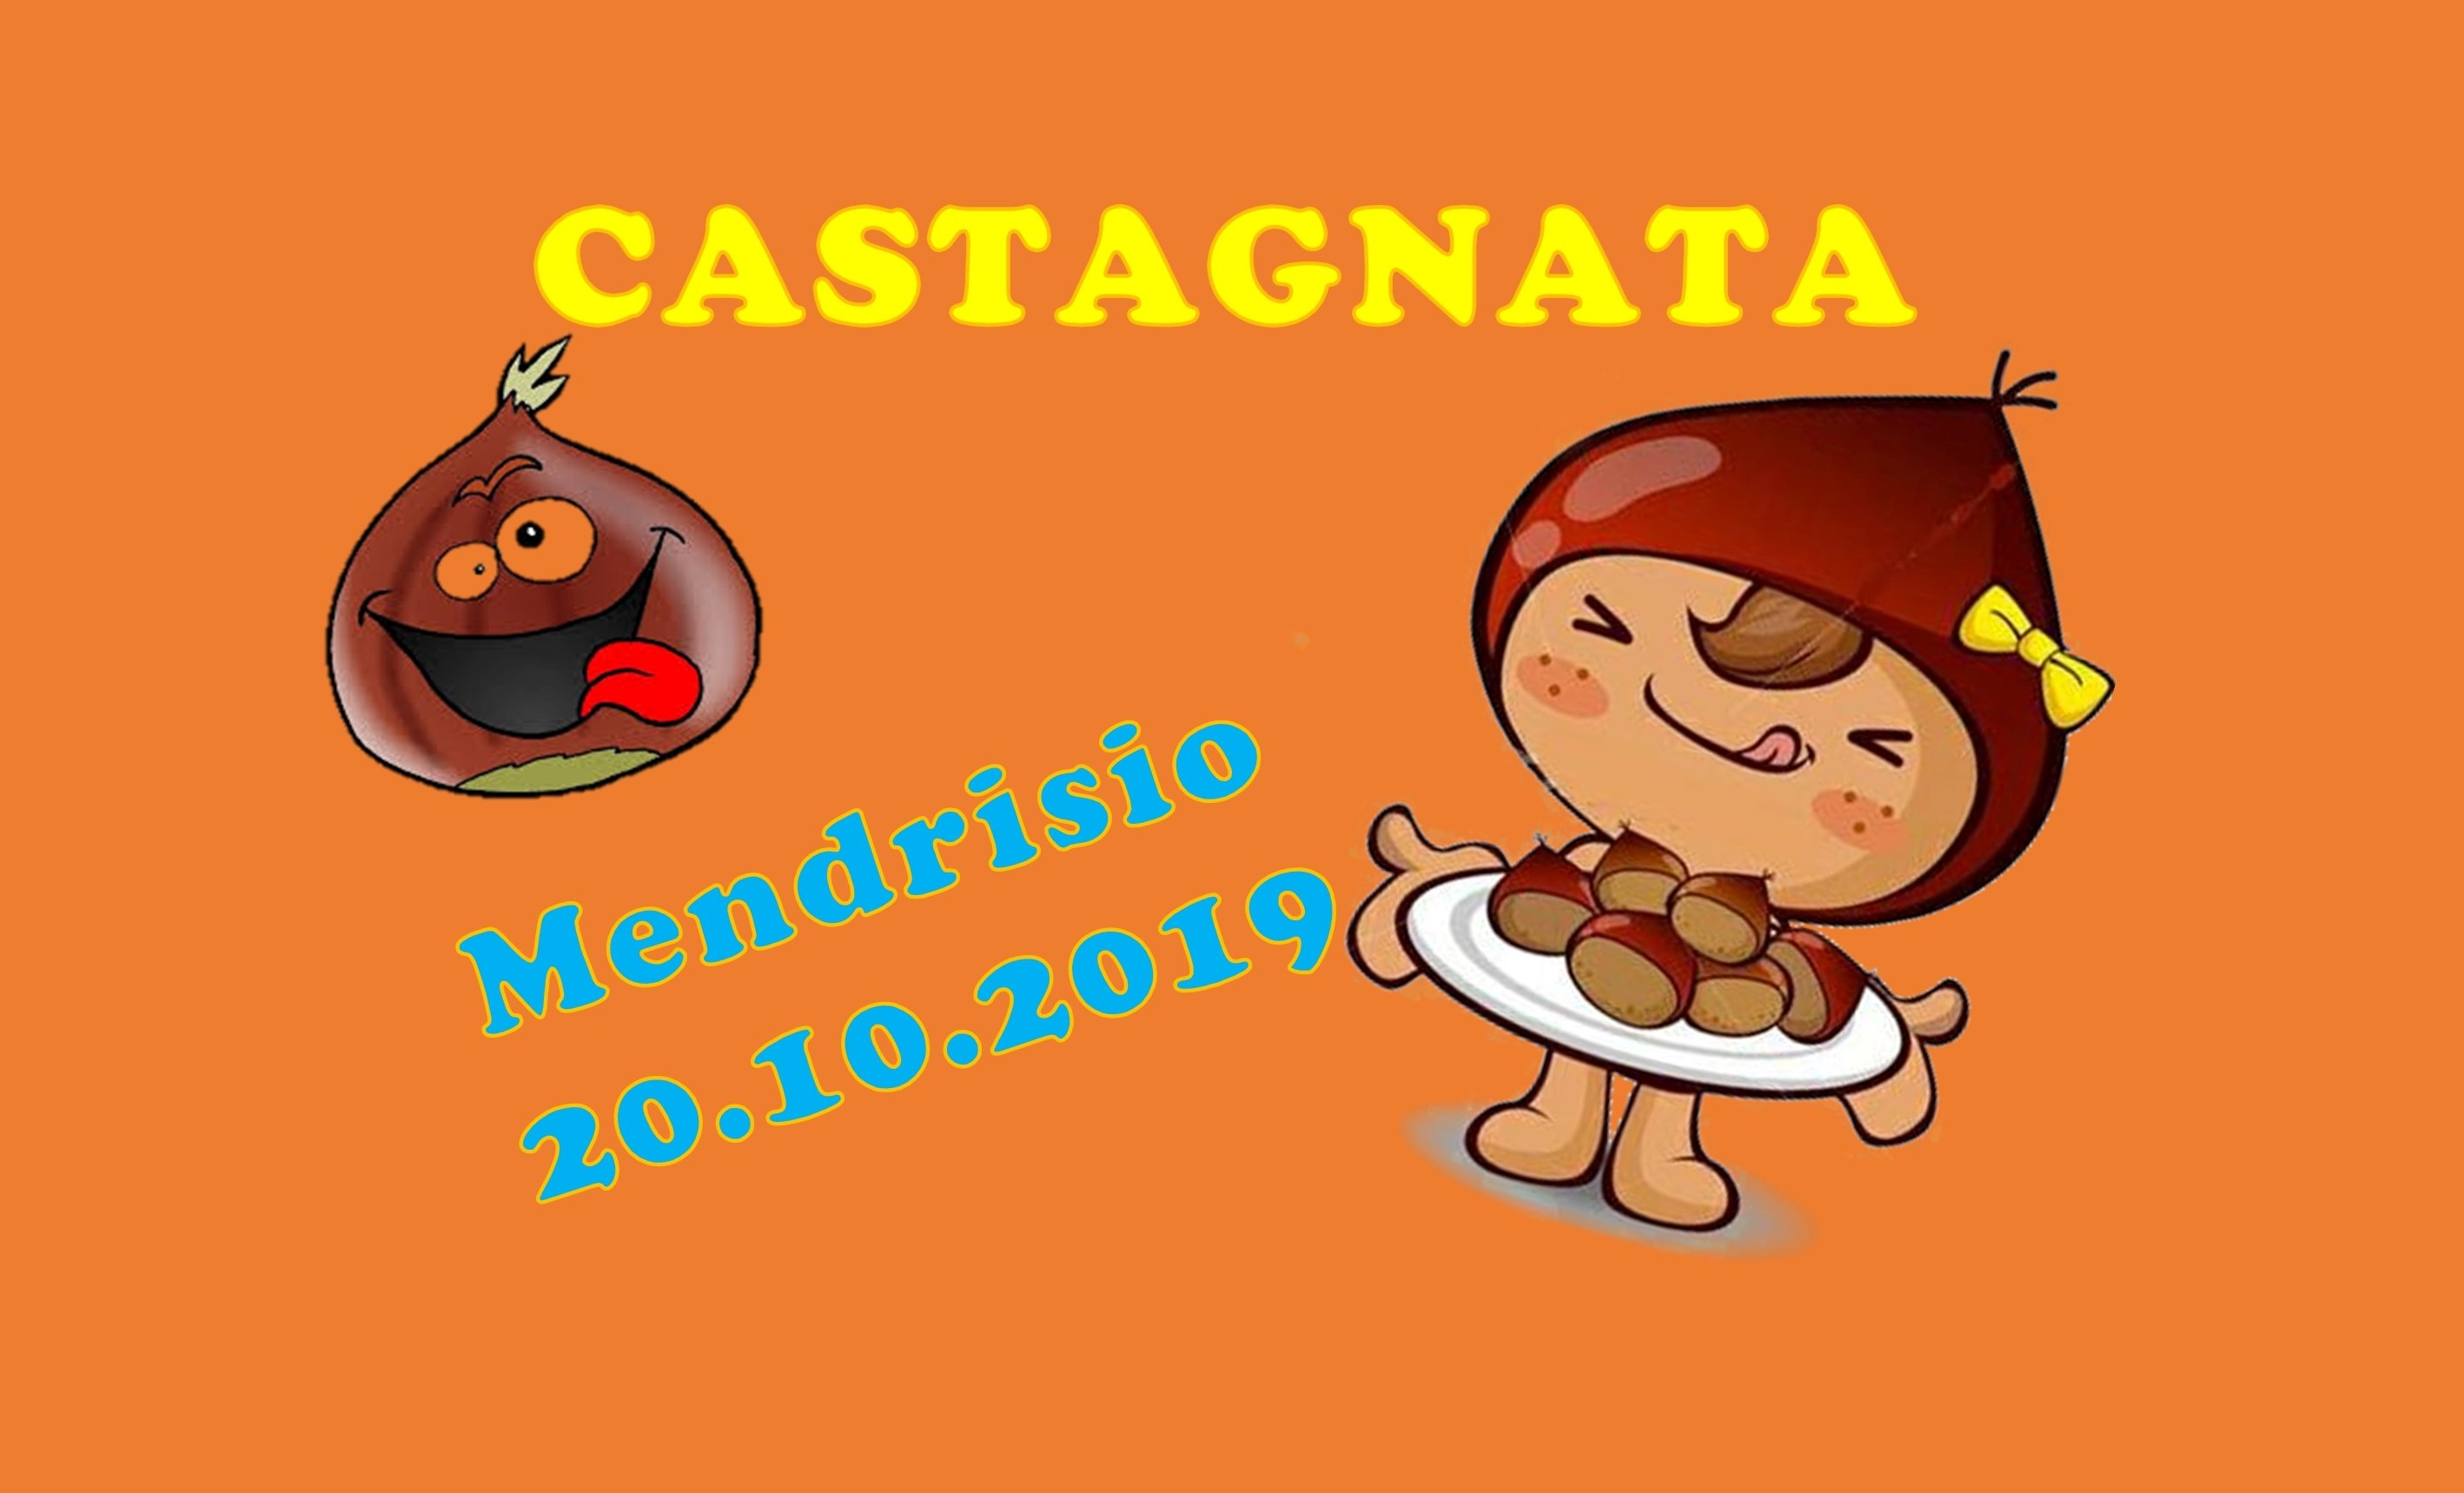 Casta1